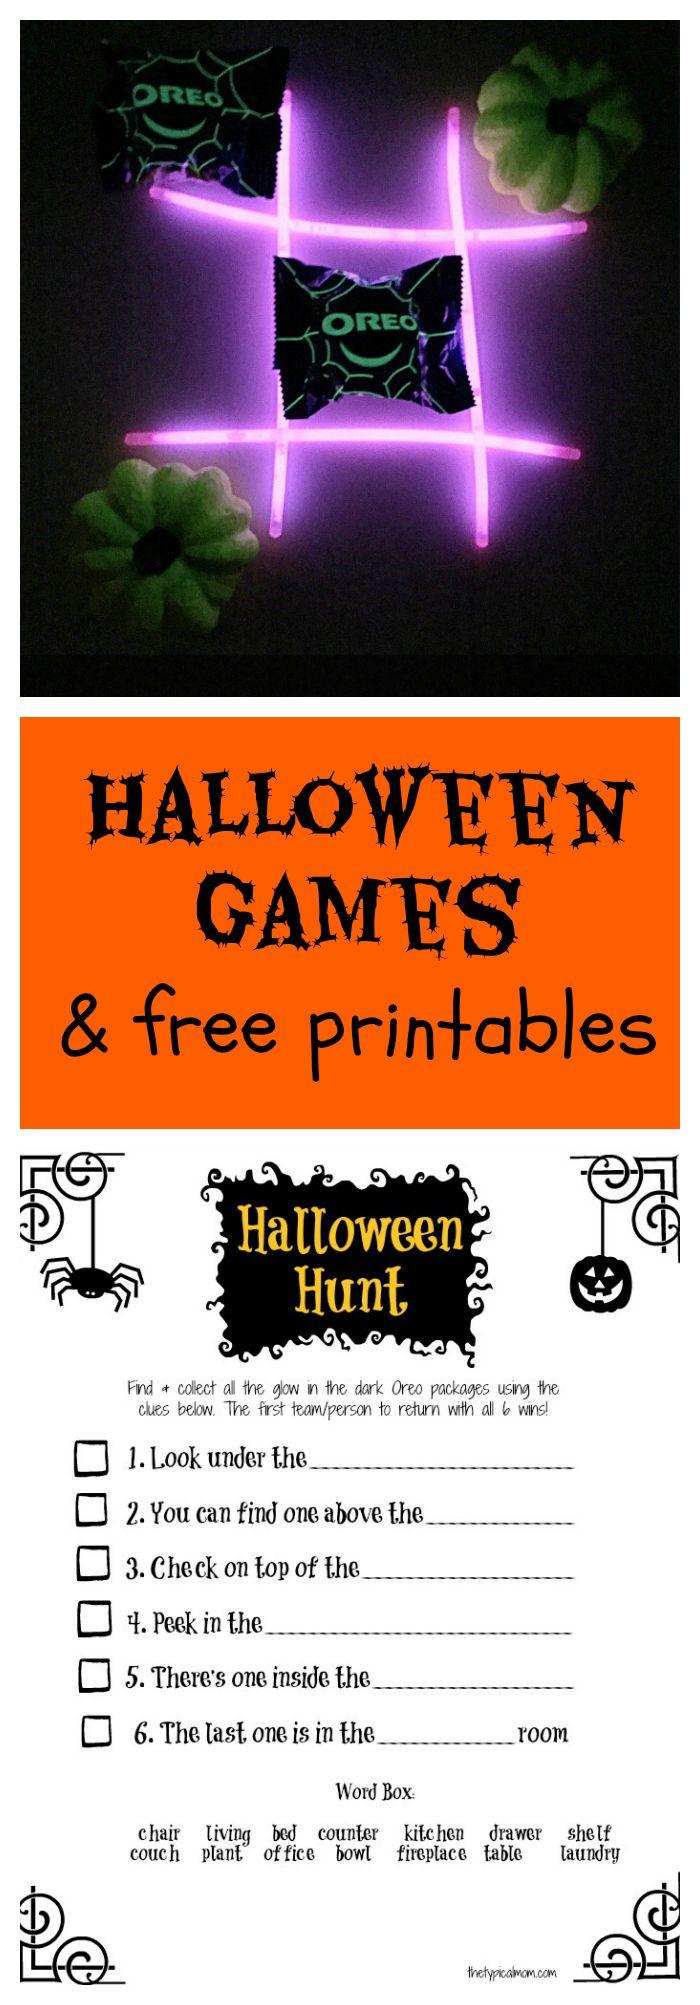 119 best Halloween images on Pinterest | Halloween stuff ...